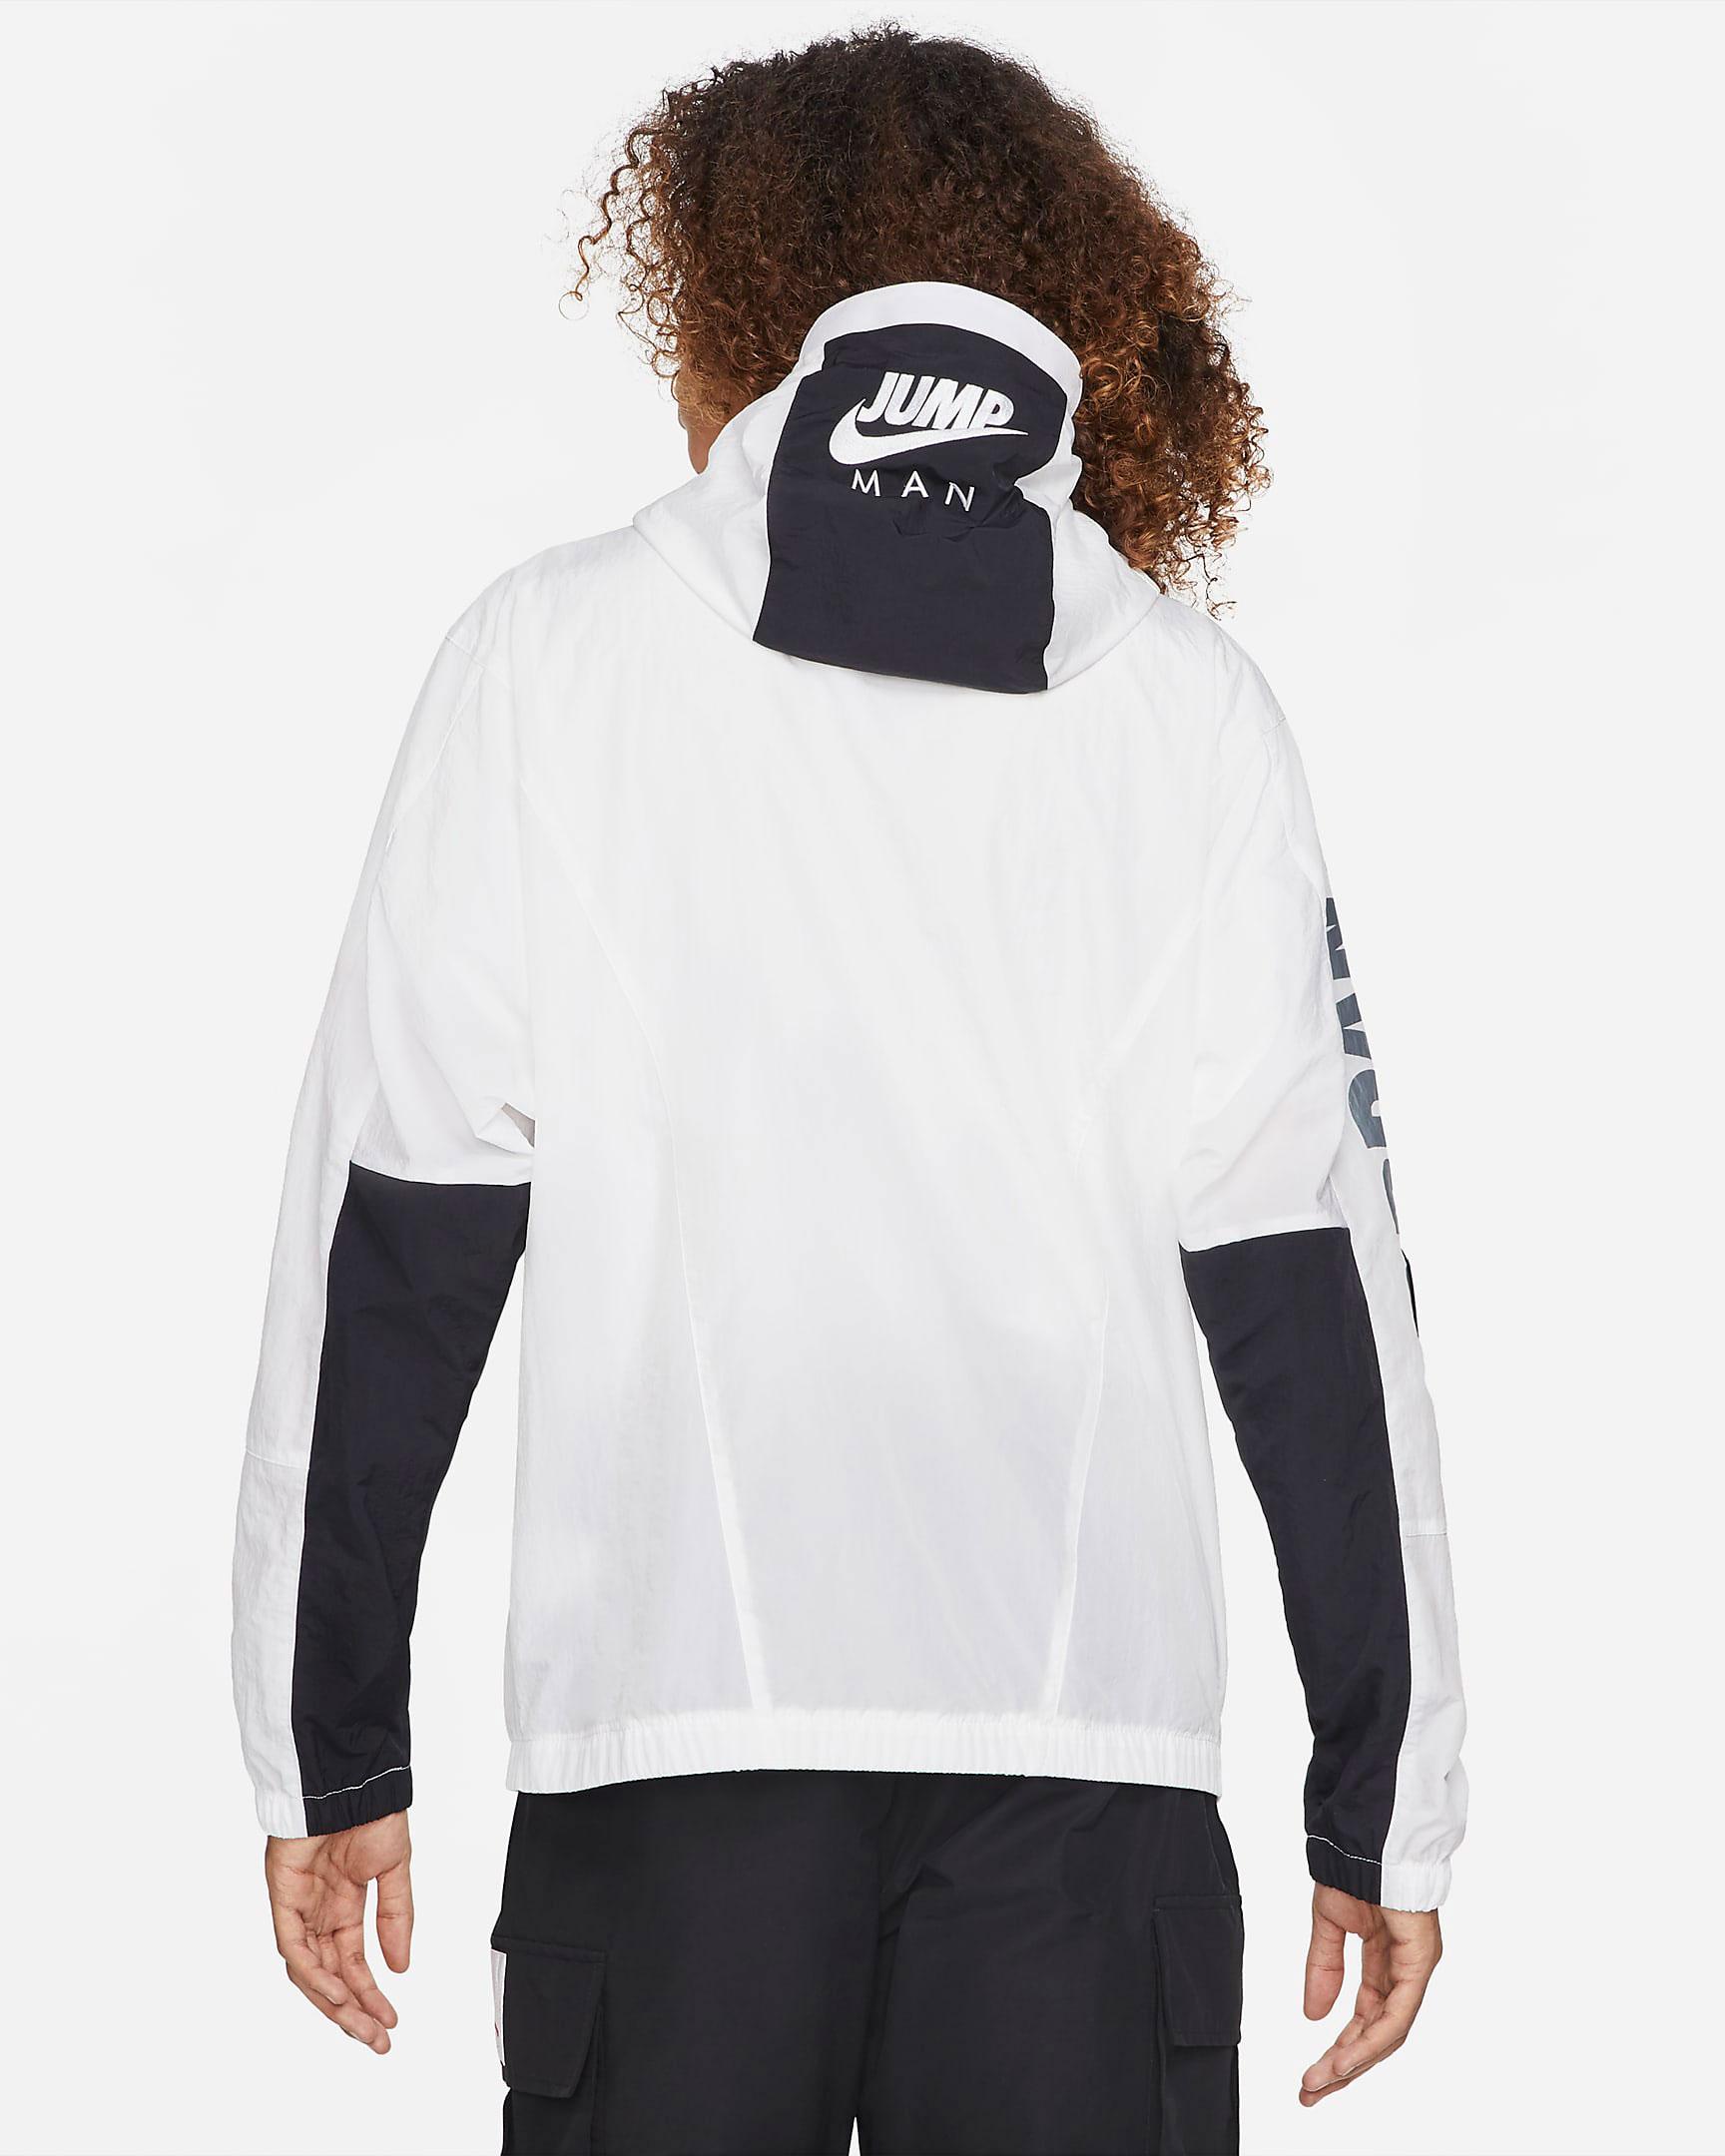 jordan-jumpman-classics-half-zip-jacket-white-black-2